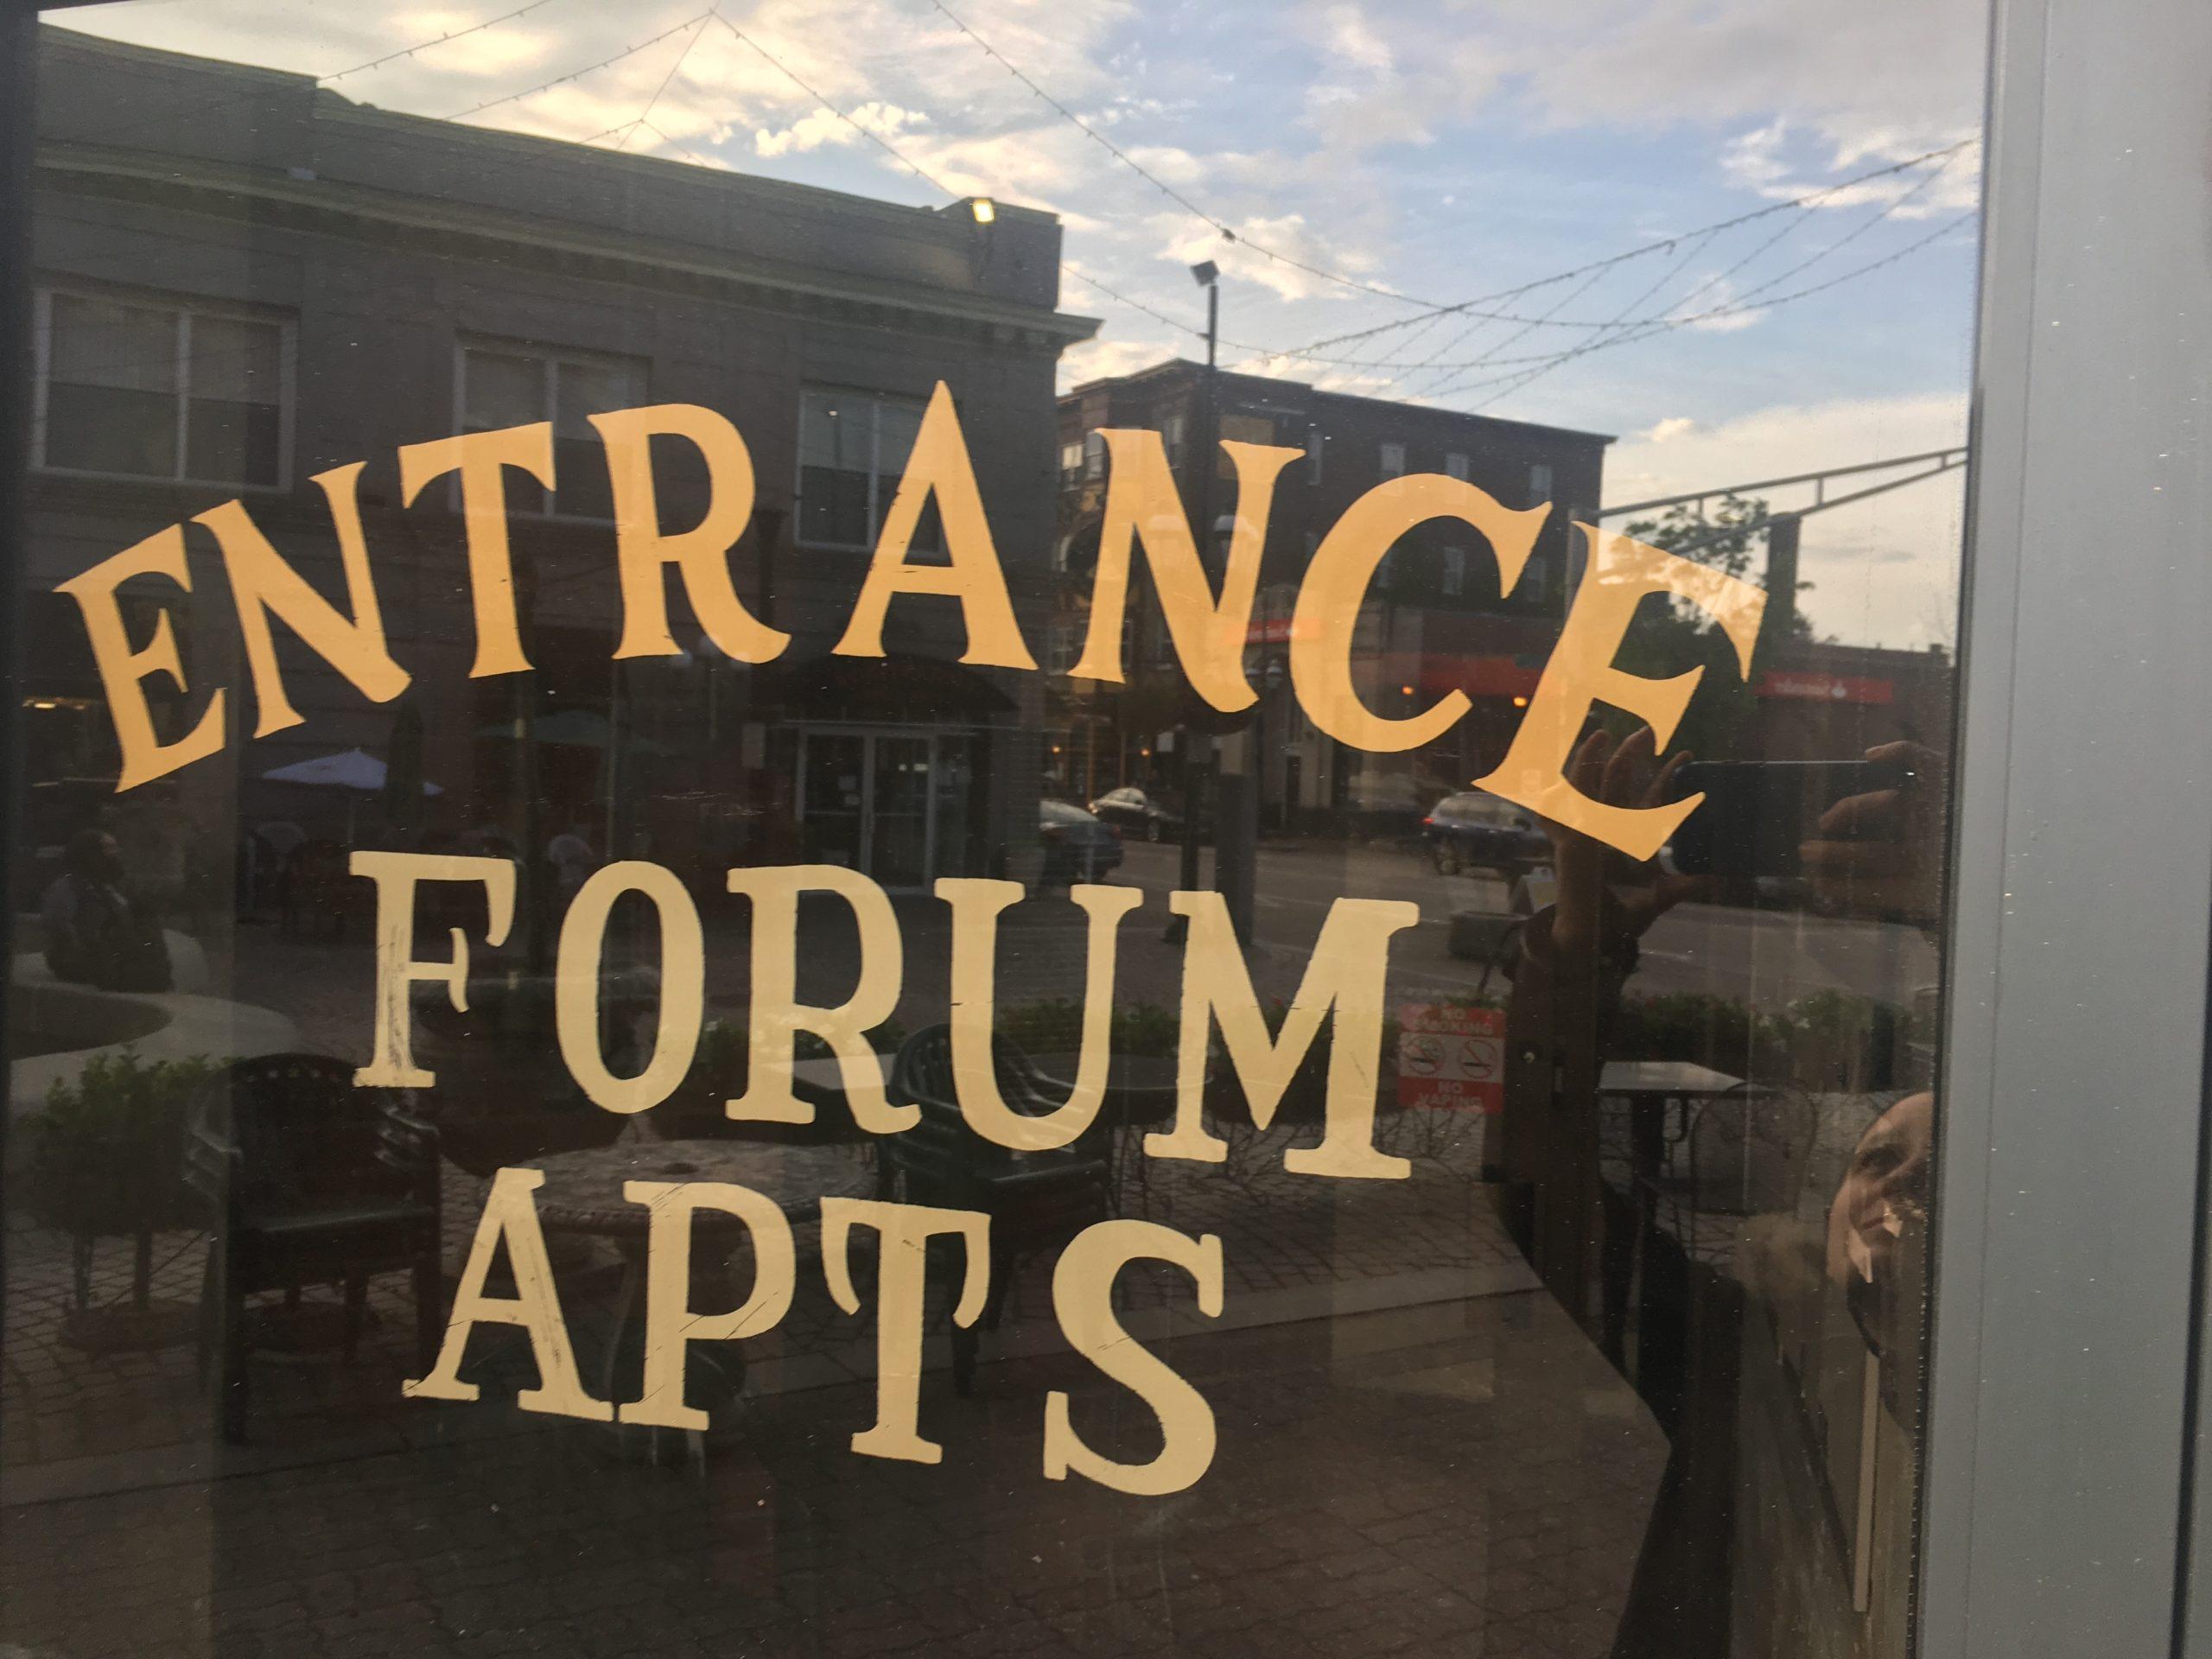 Forum Apts